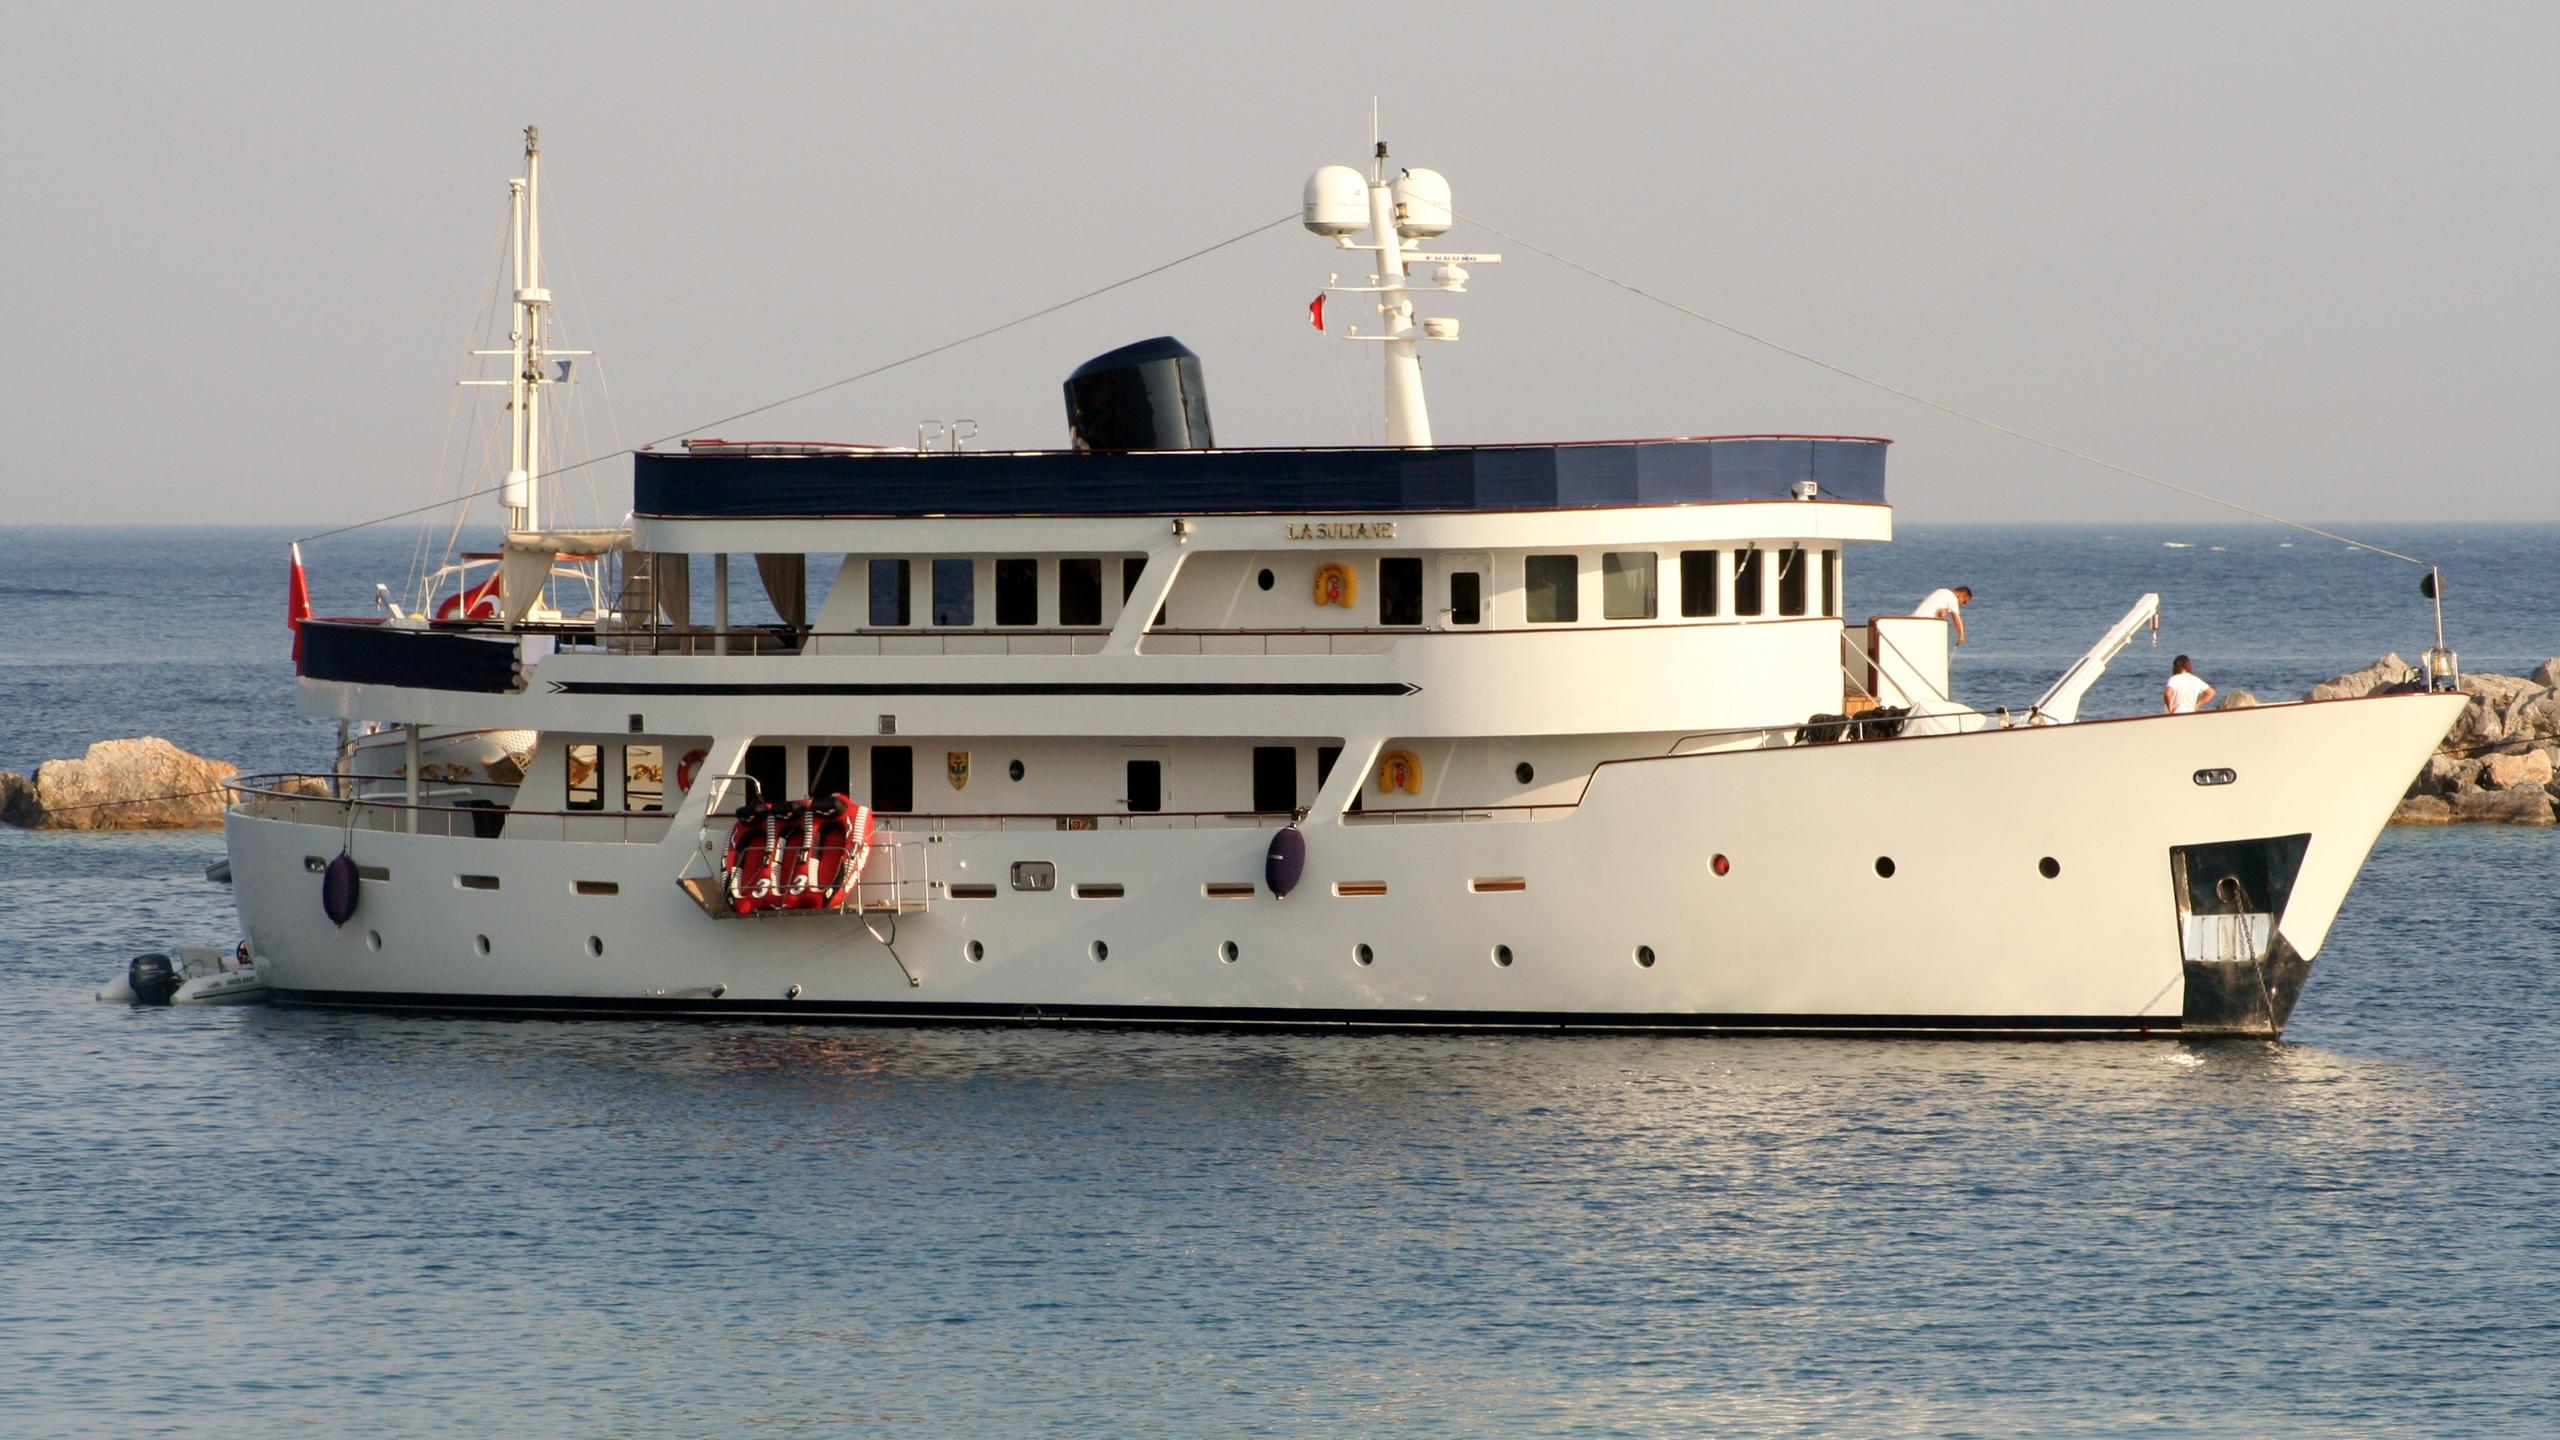 donna del mar la sultane motoryacht aegean yacht 34m 2006 profile